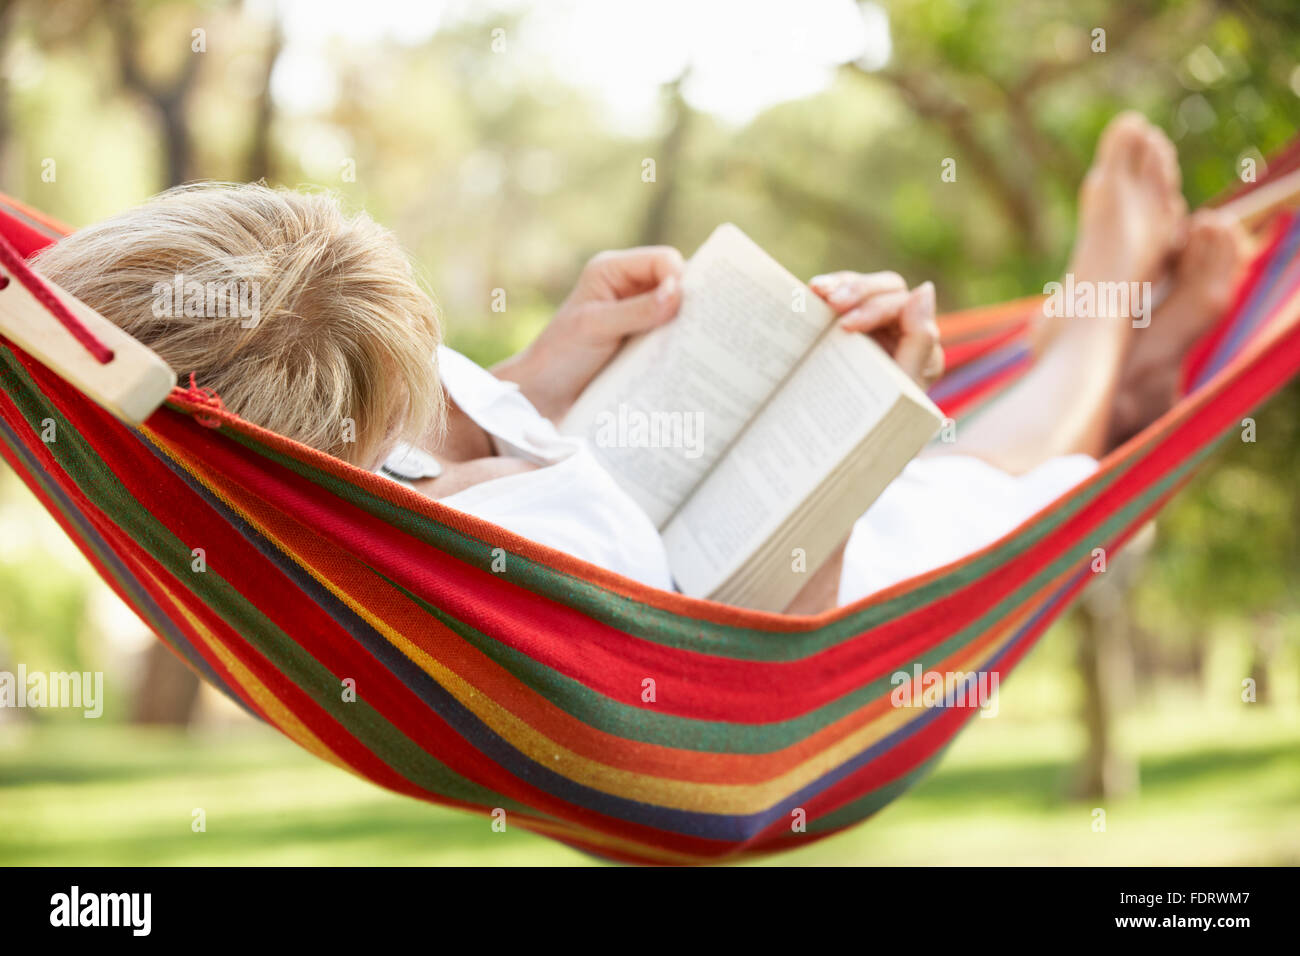 leisure,relaxation,recreation,reading,hammock - Stock Image